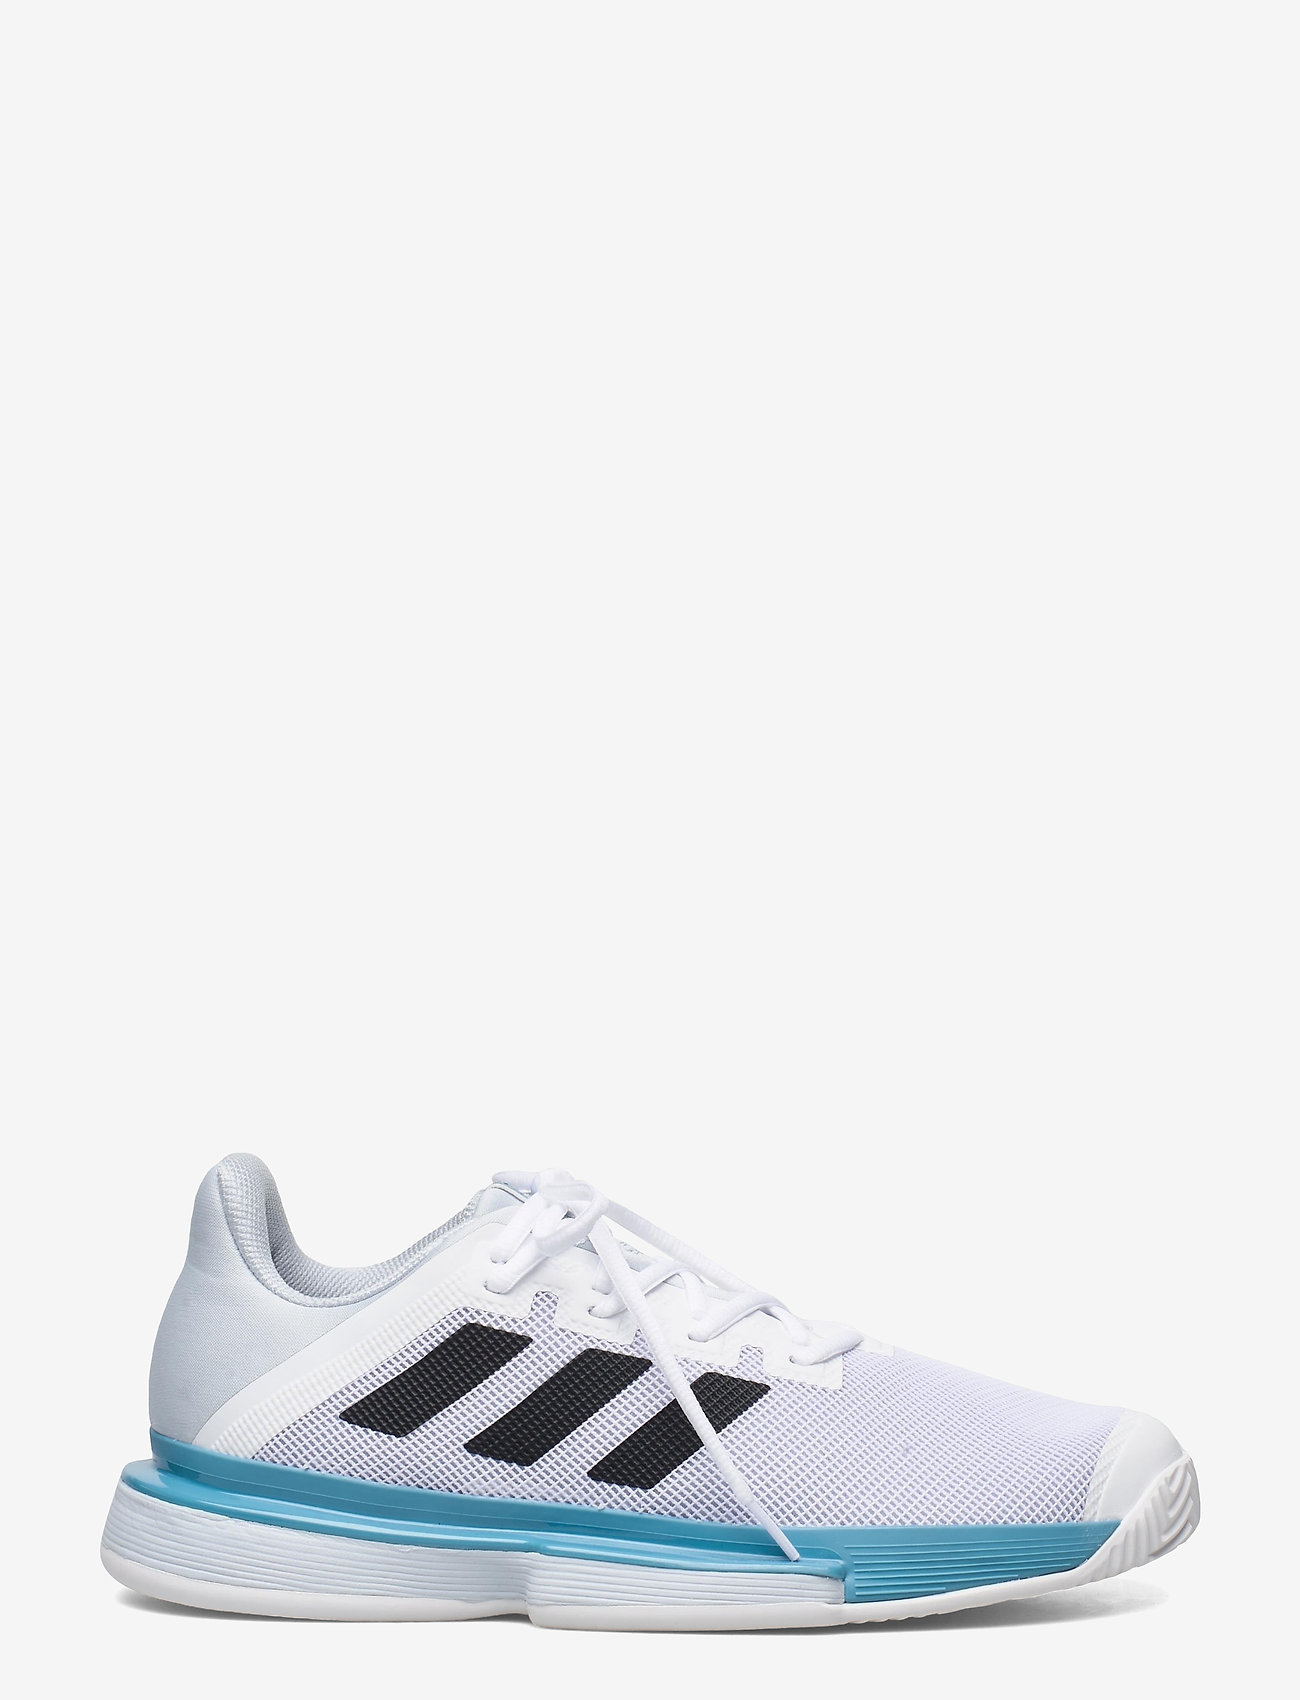 adidas Performance - SOLEMATCH BOUNCE M - ketsjersportsko - white - 1